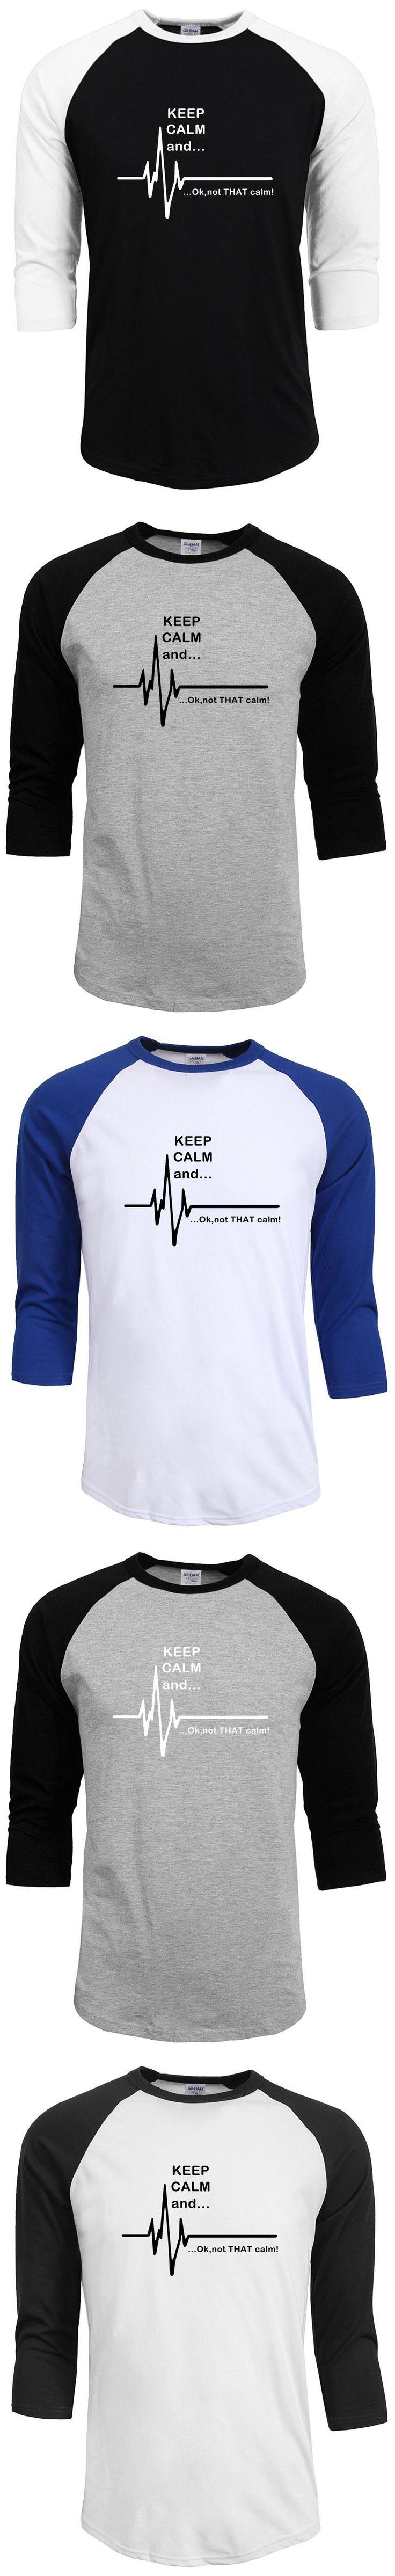 2017 new 100% Cotton raglan Sleeve Men's T-Shirts Keep Calm And ... Not That Calm - Funny Ecg Heart Rate Paramedic Nurse T Shirt